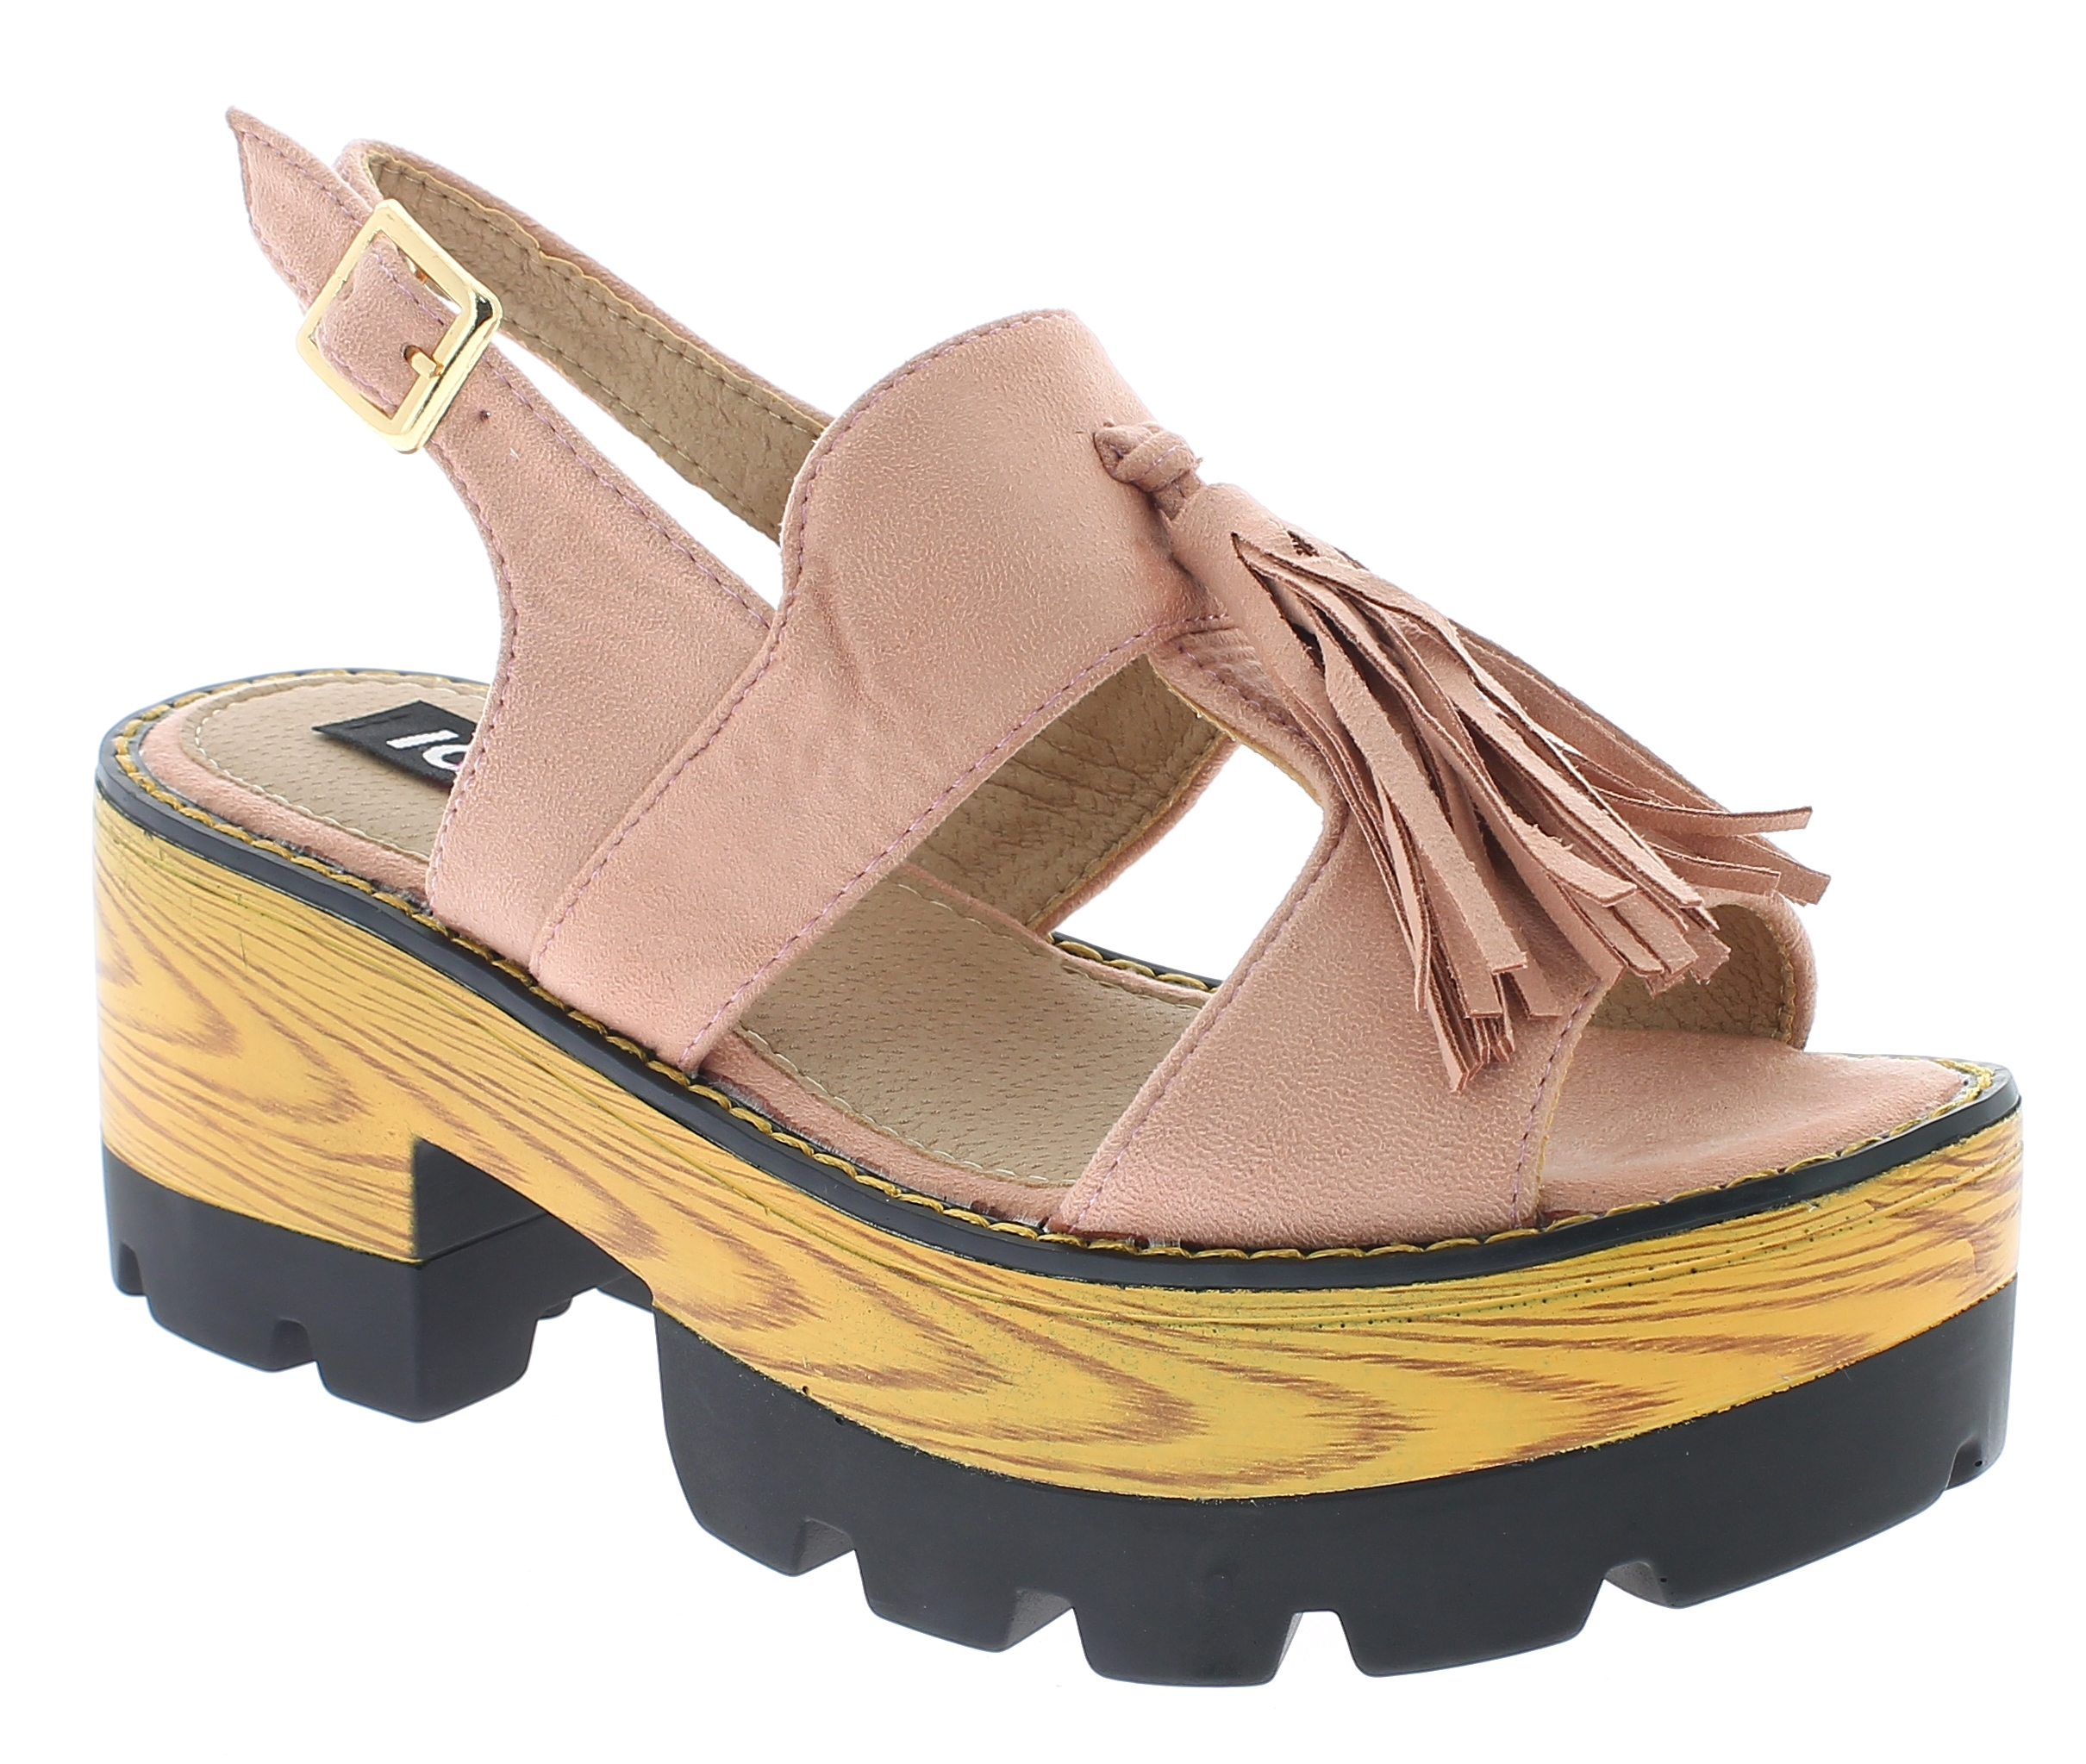 IQSHOES Γυναικείο Πέδιλο 5A5716 Ρόζ - IqShoes - 5A5716 PINK-pink-36/1/11/7 παπούτσια  πέδιλα